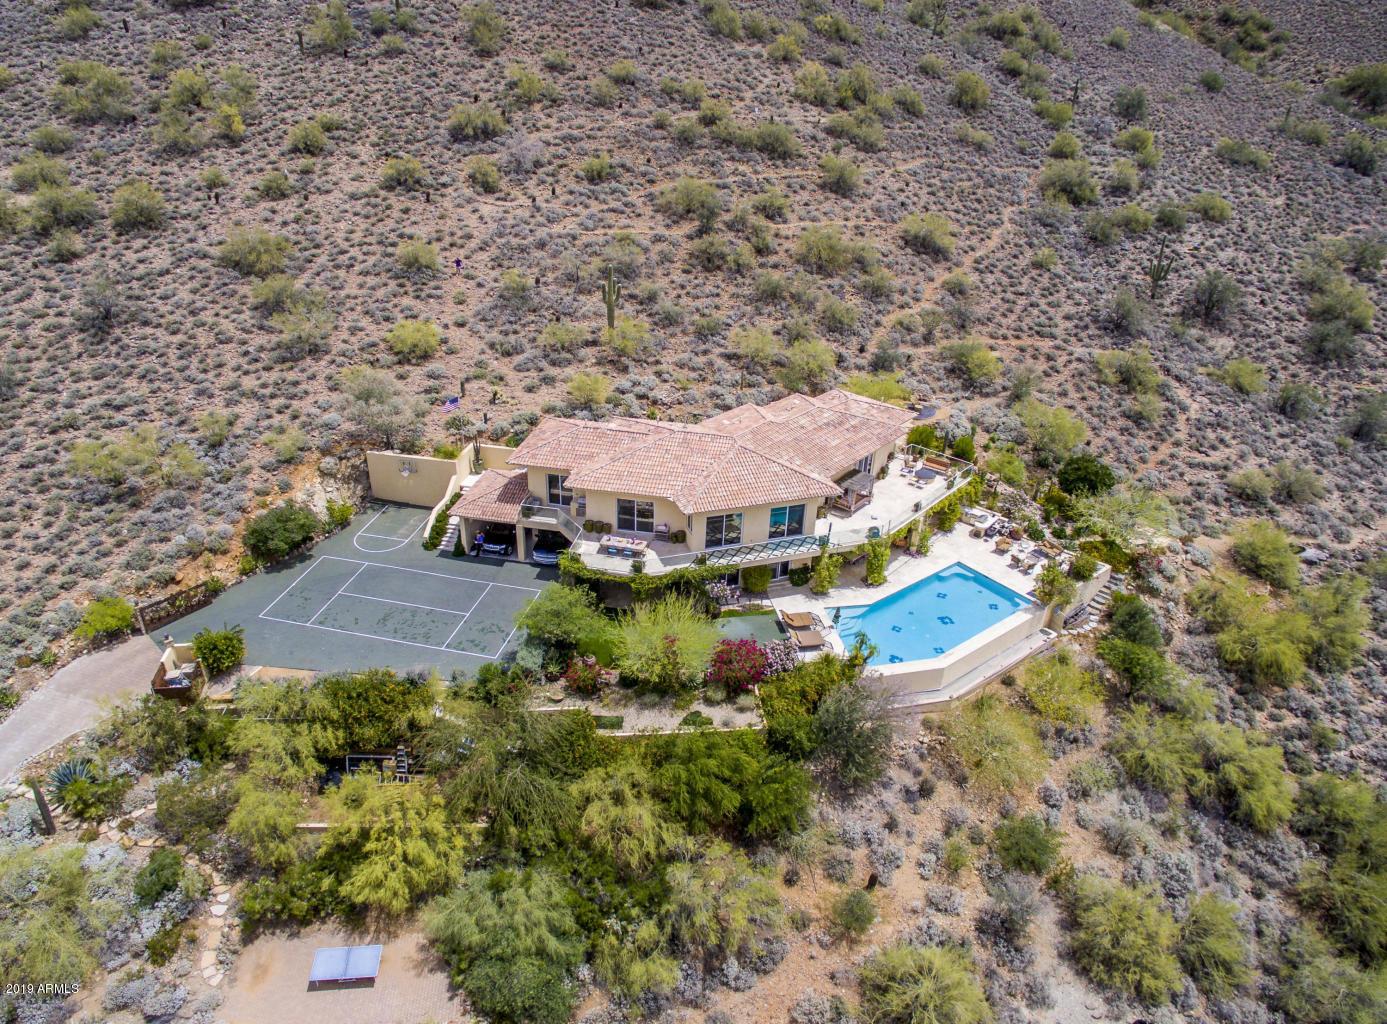 36879 N 38th Street, Cave Creek AZ 85331 - Photo 1